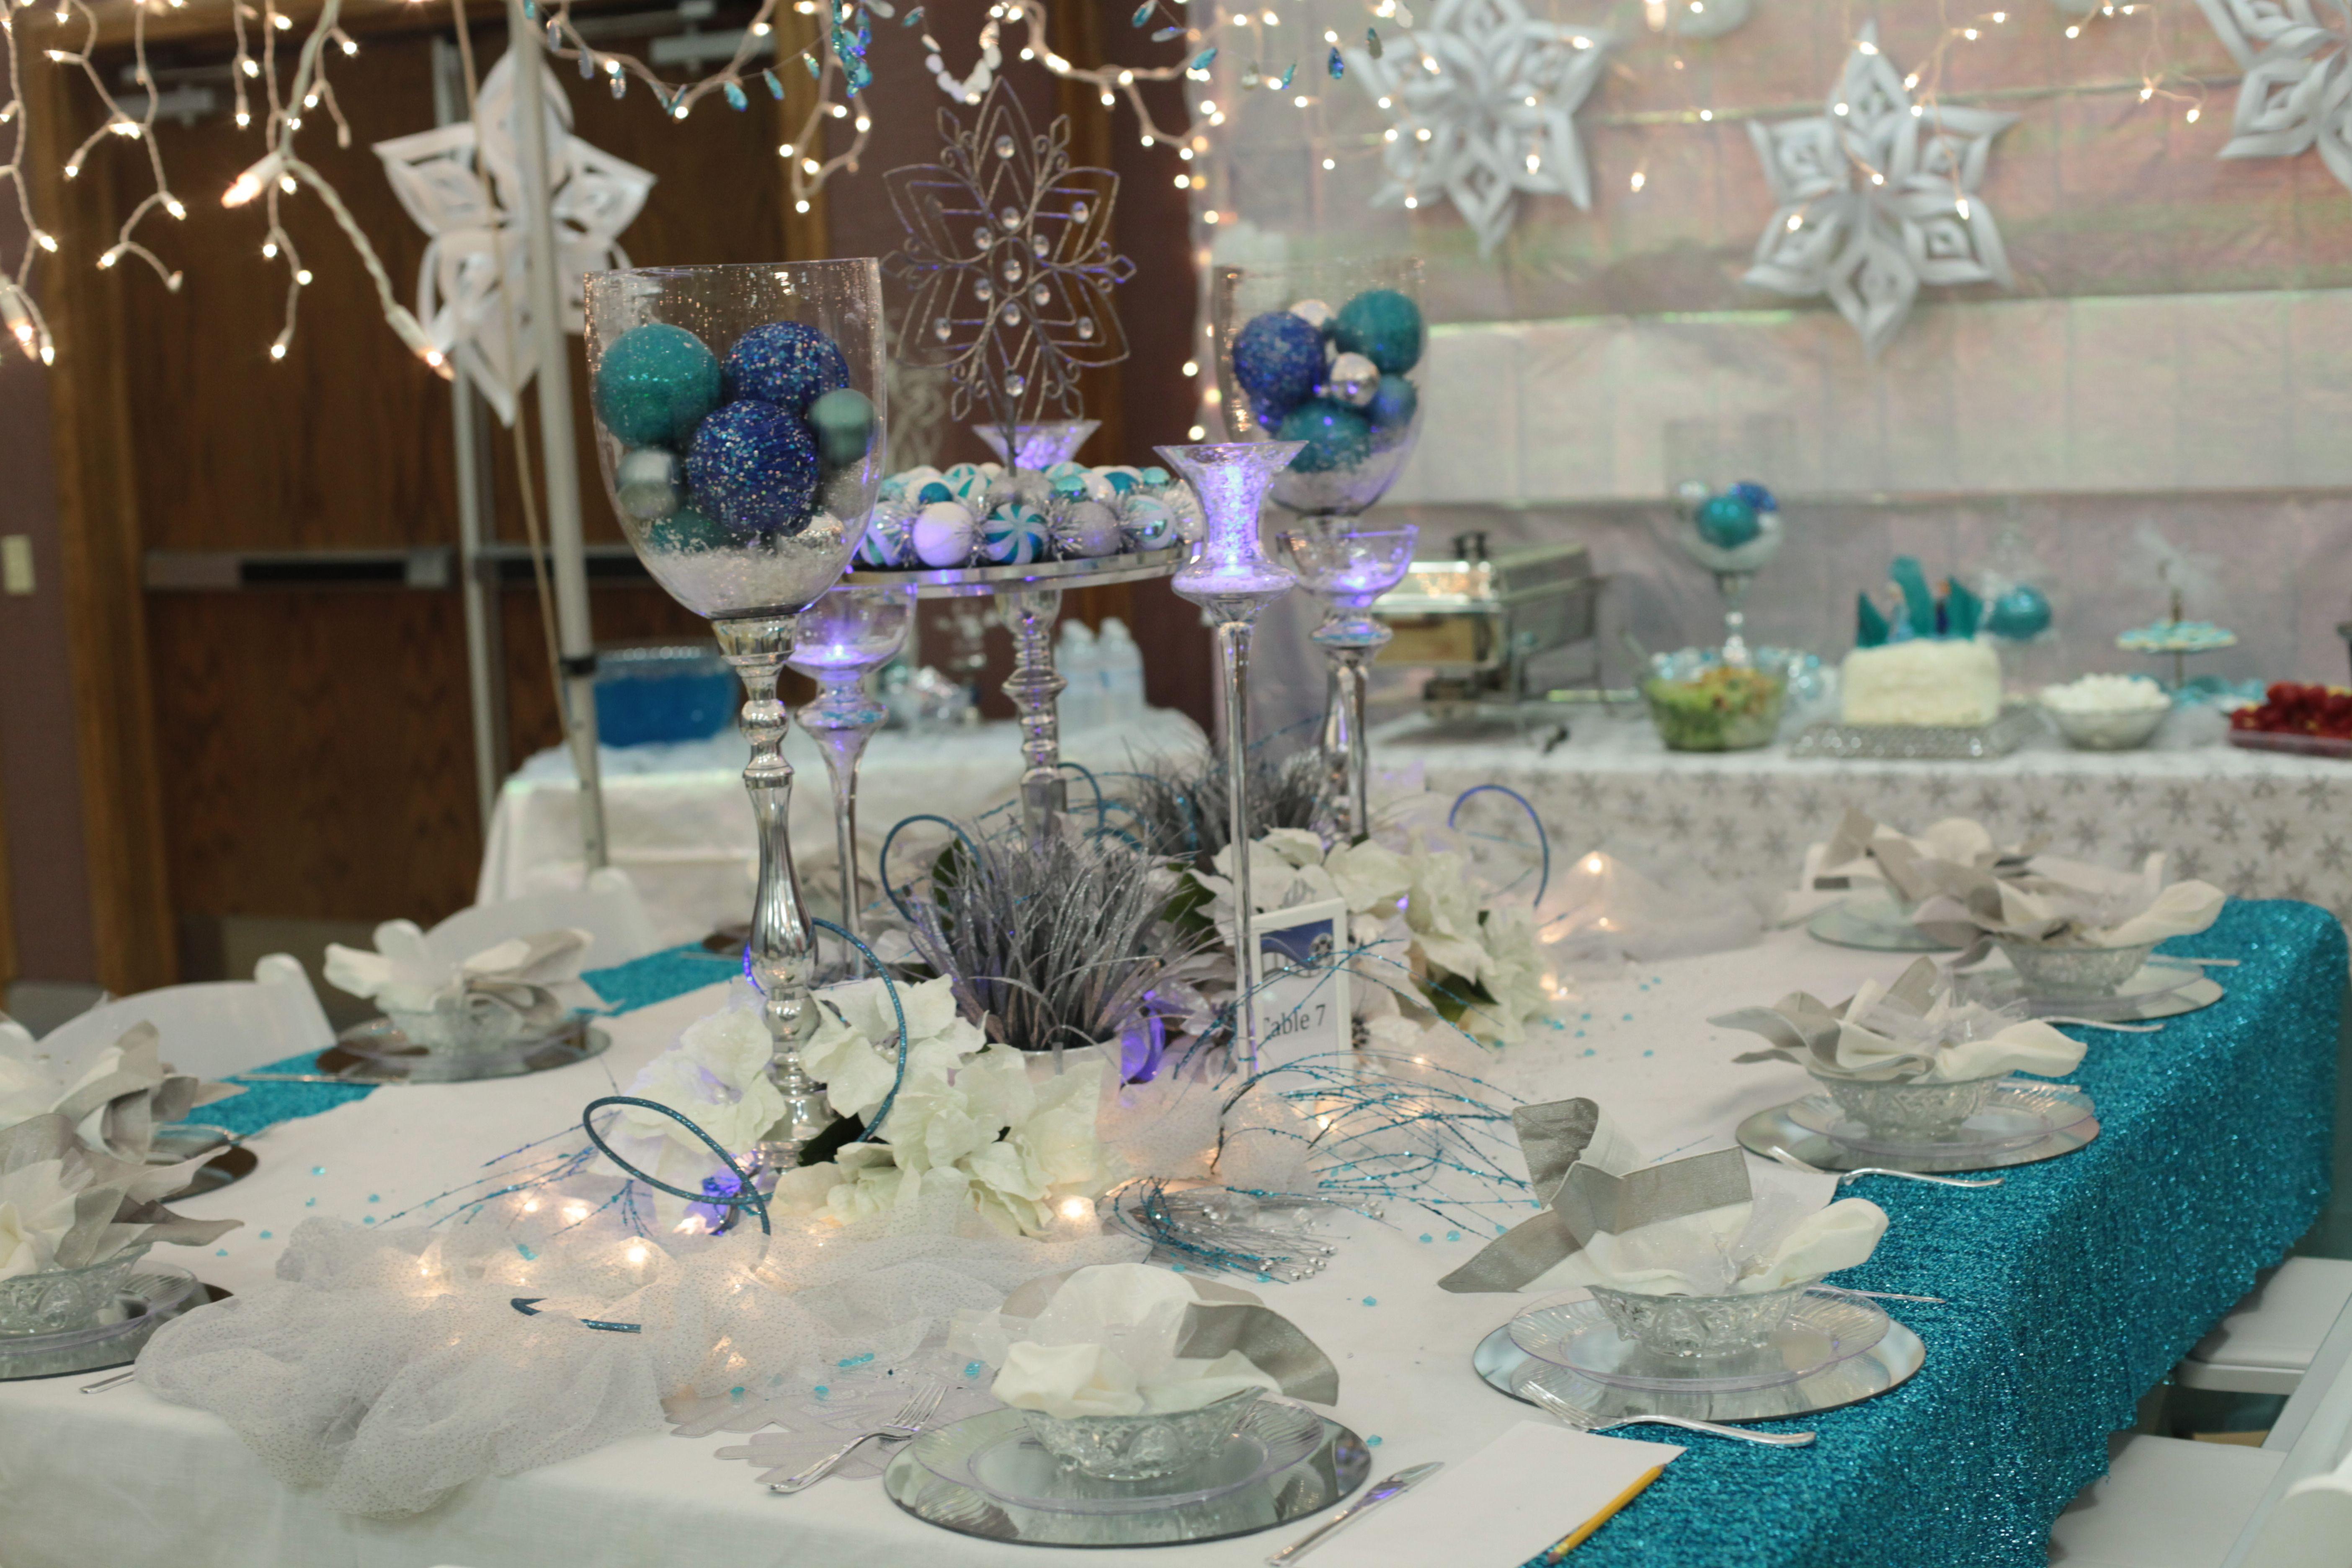 frozen table setting - Google Search | party ideas | Pinterest ...